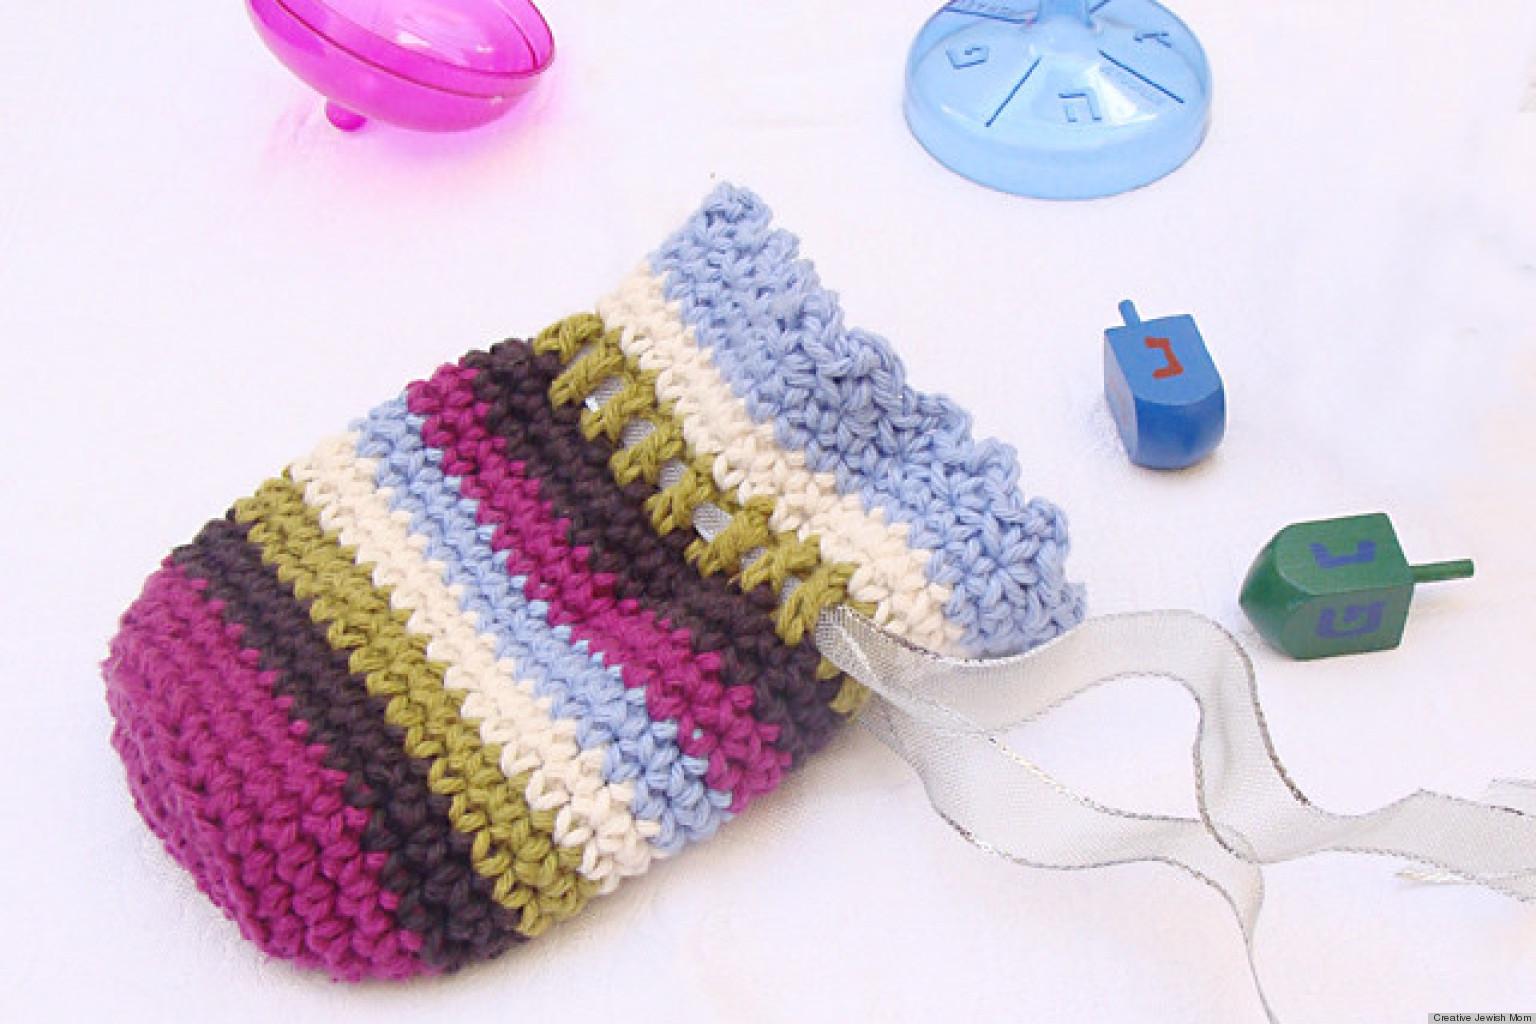 Hanukkah Craft Ideas Striped Crochet Pouch For Gelt